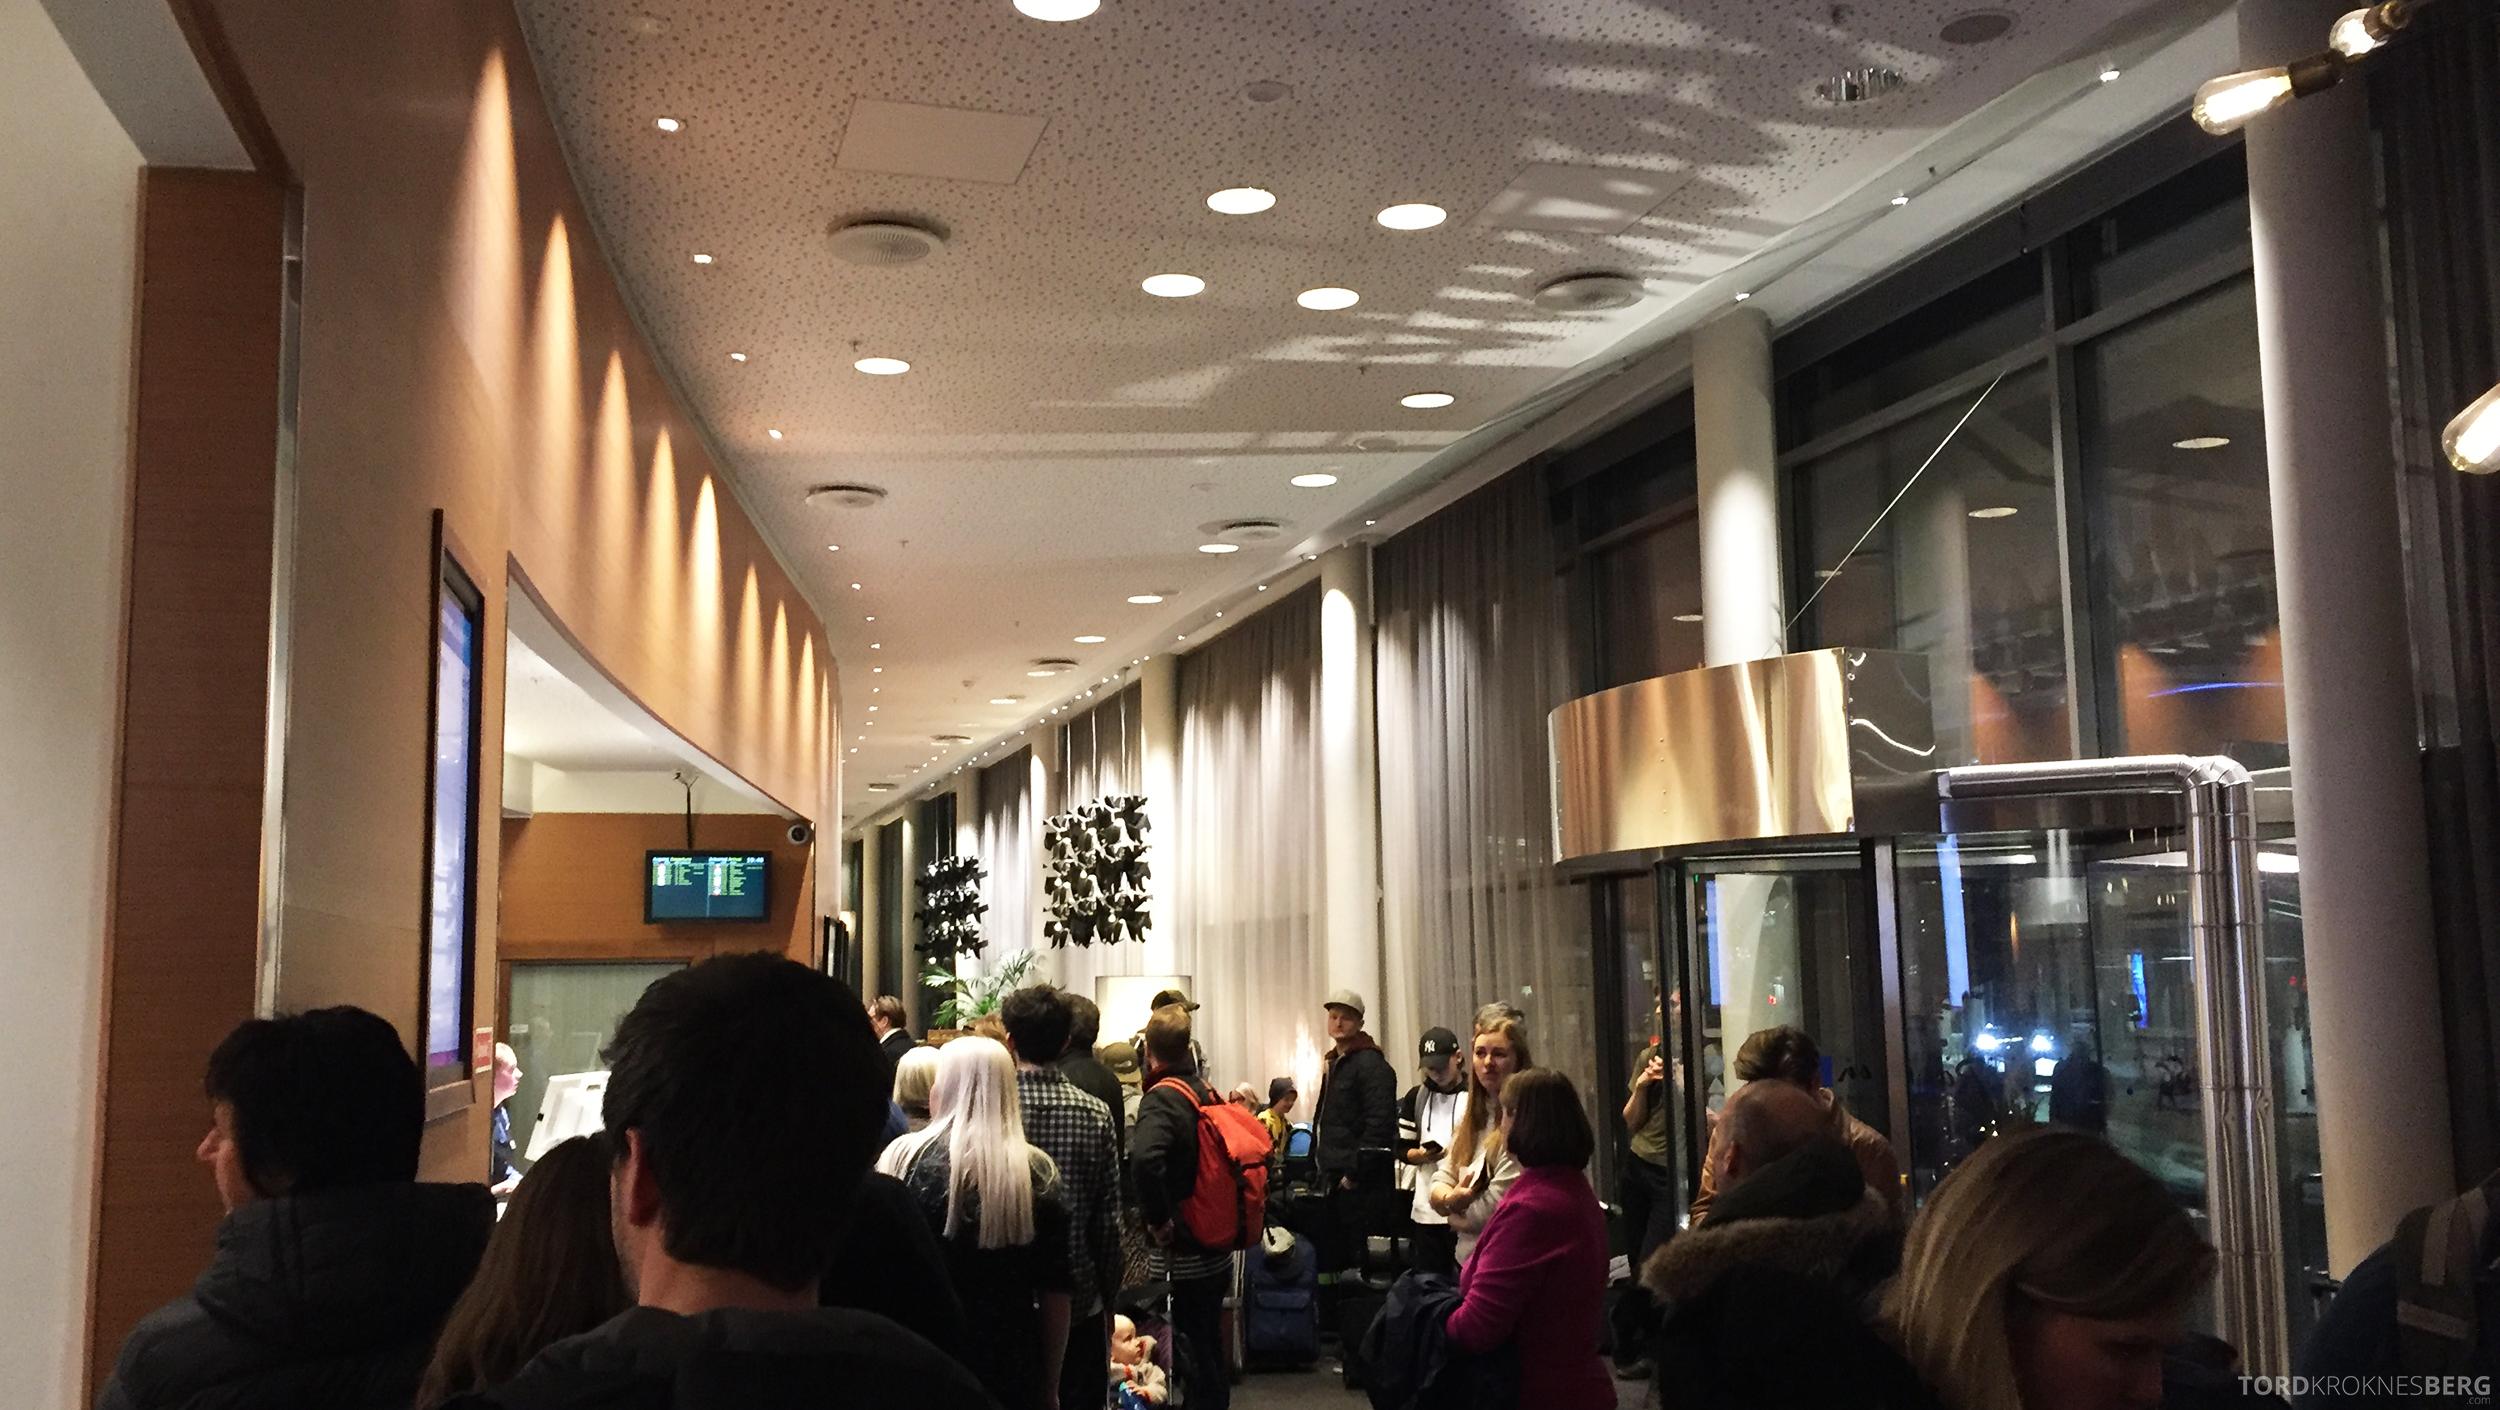 Radisson Blu Airport Hotel Trondheim kaotisk resepsjon